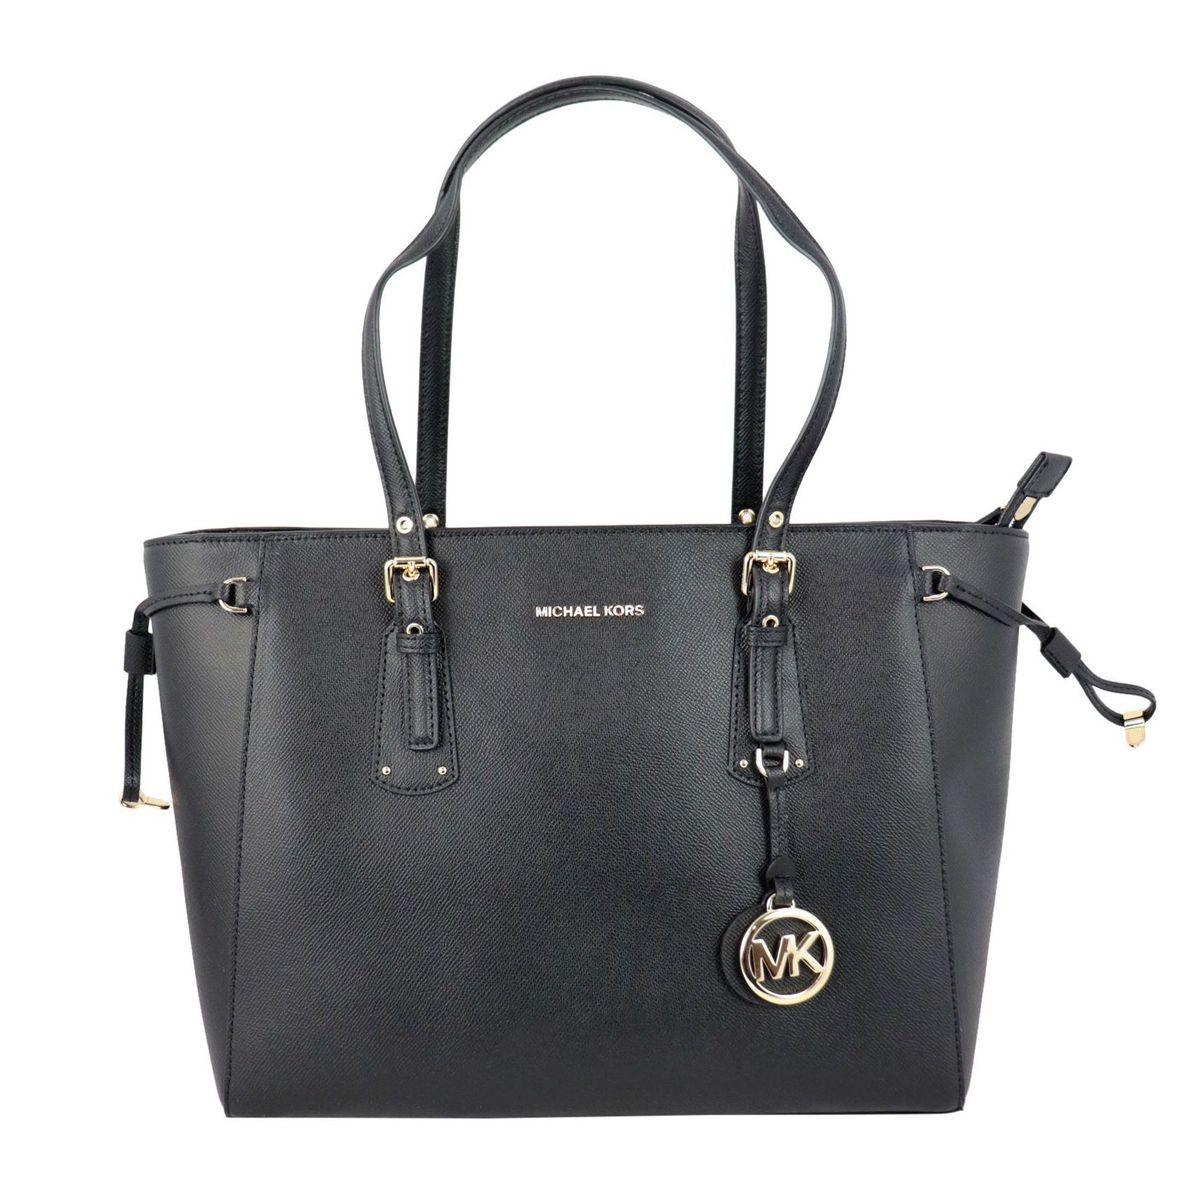 VOYAGER medium leather tote bag Black Michael Kors